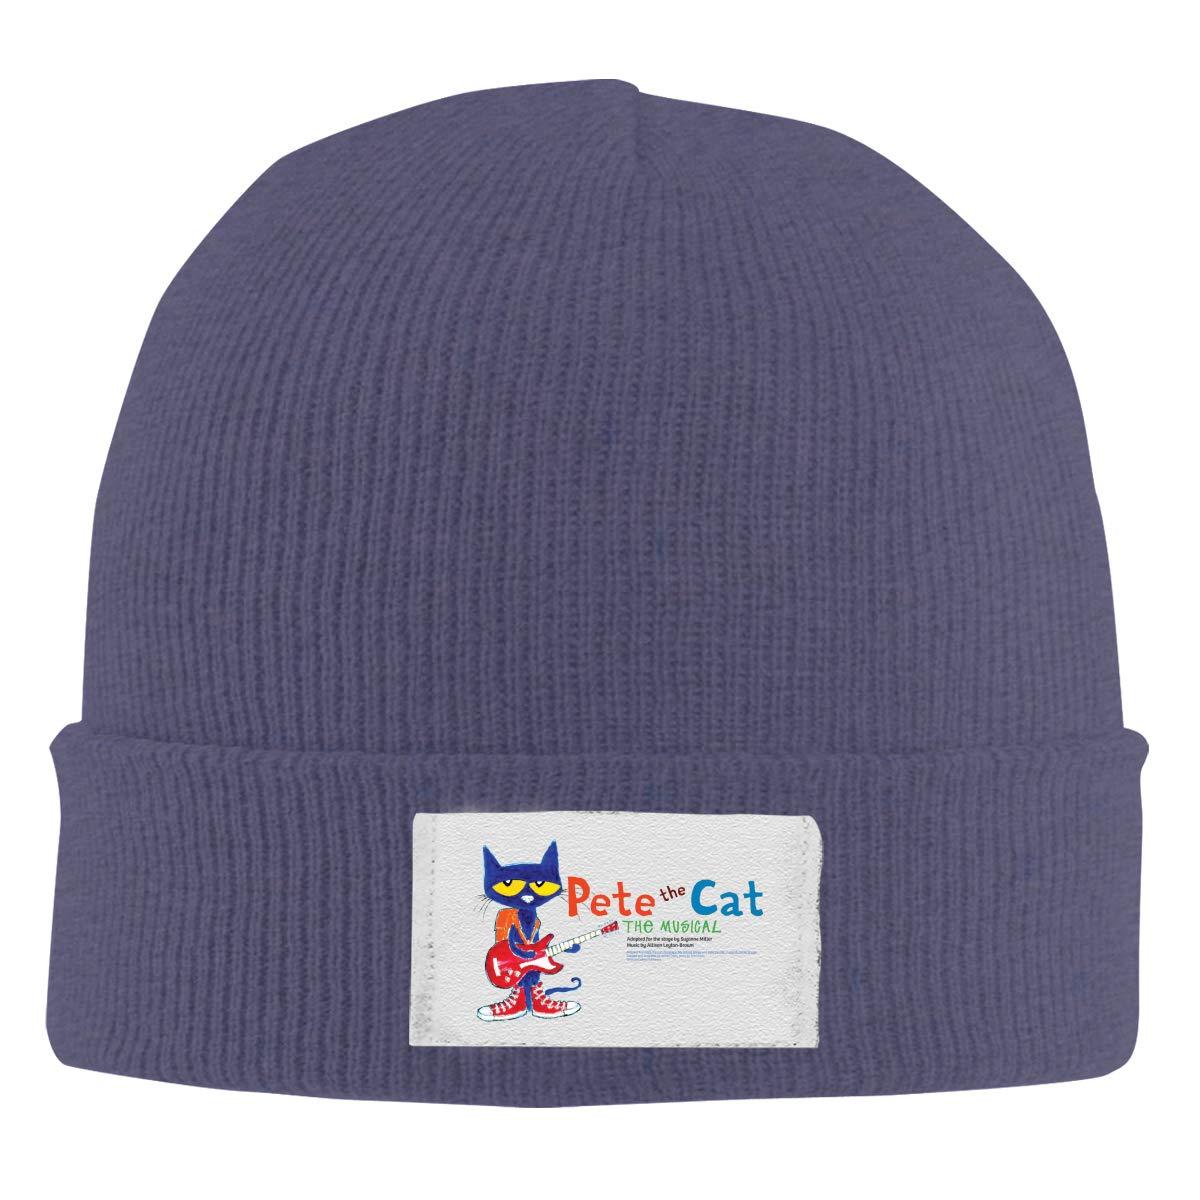 Unisex Stylish Slouch Beanie Hats Black Pete Cat Top Level Beanie Men Women